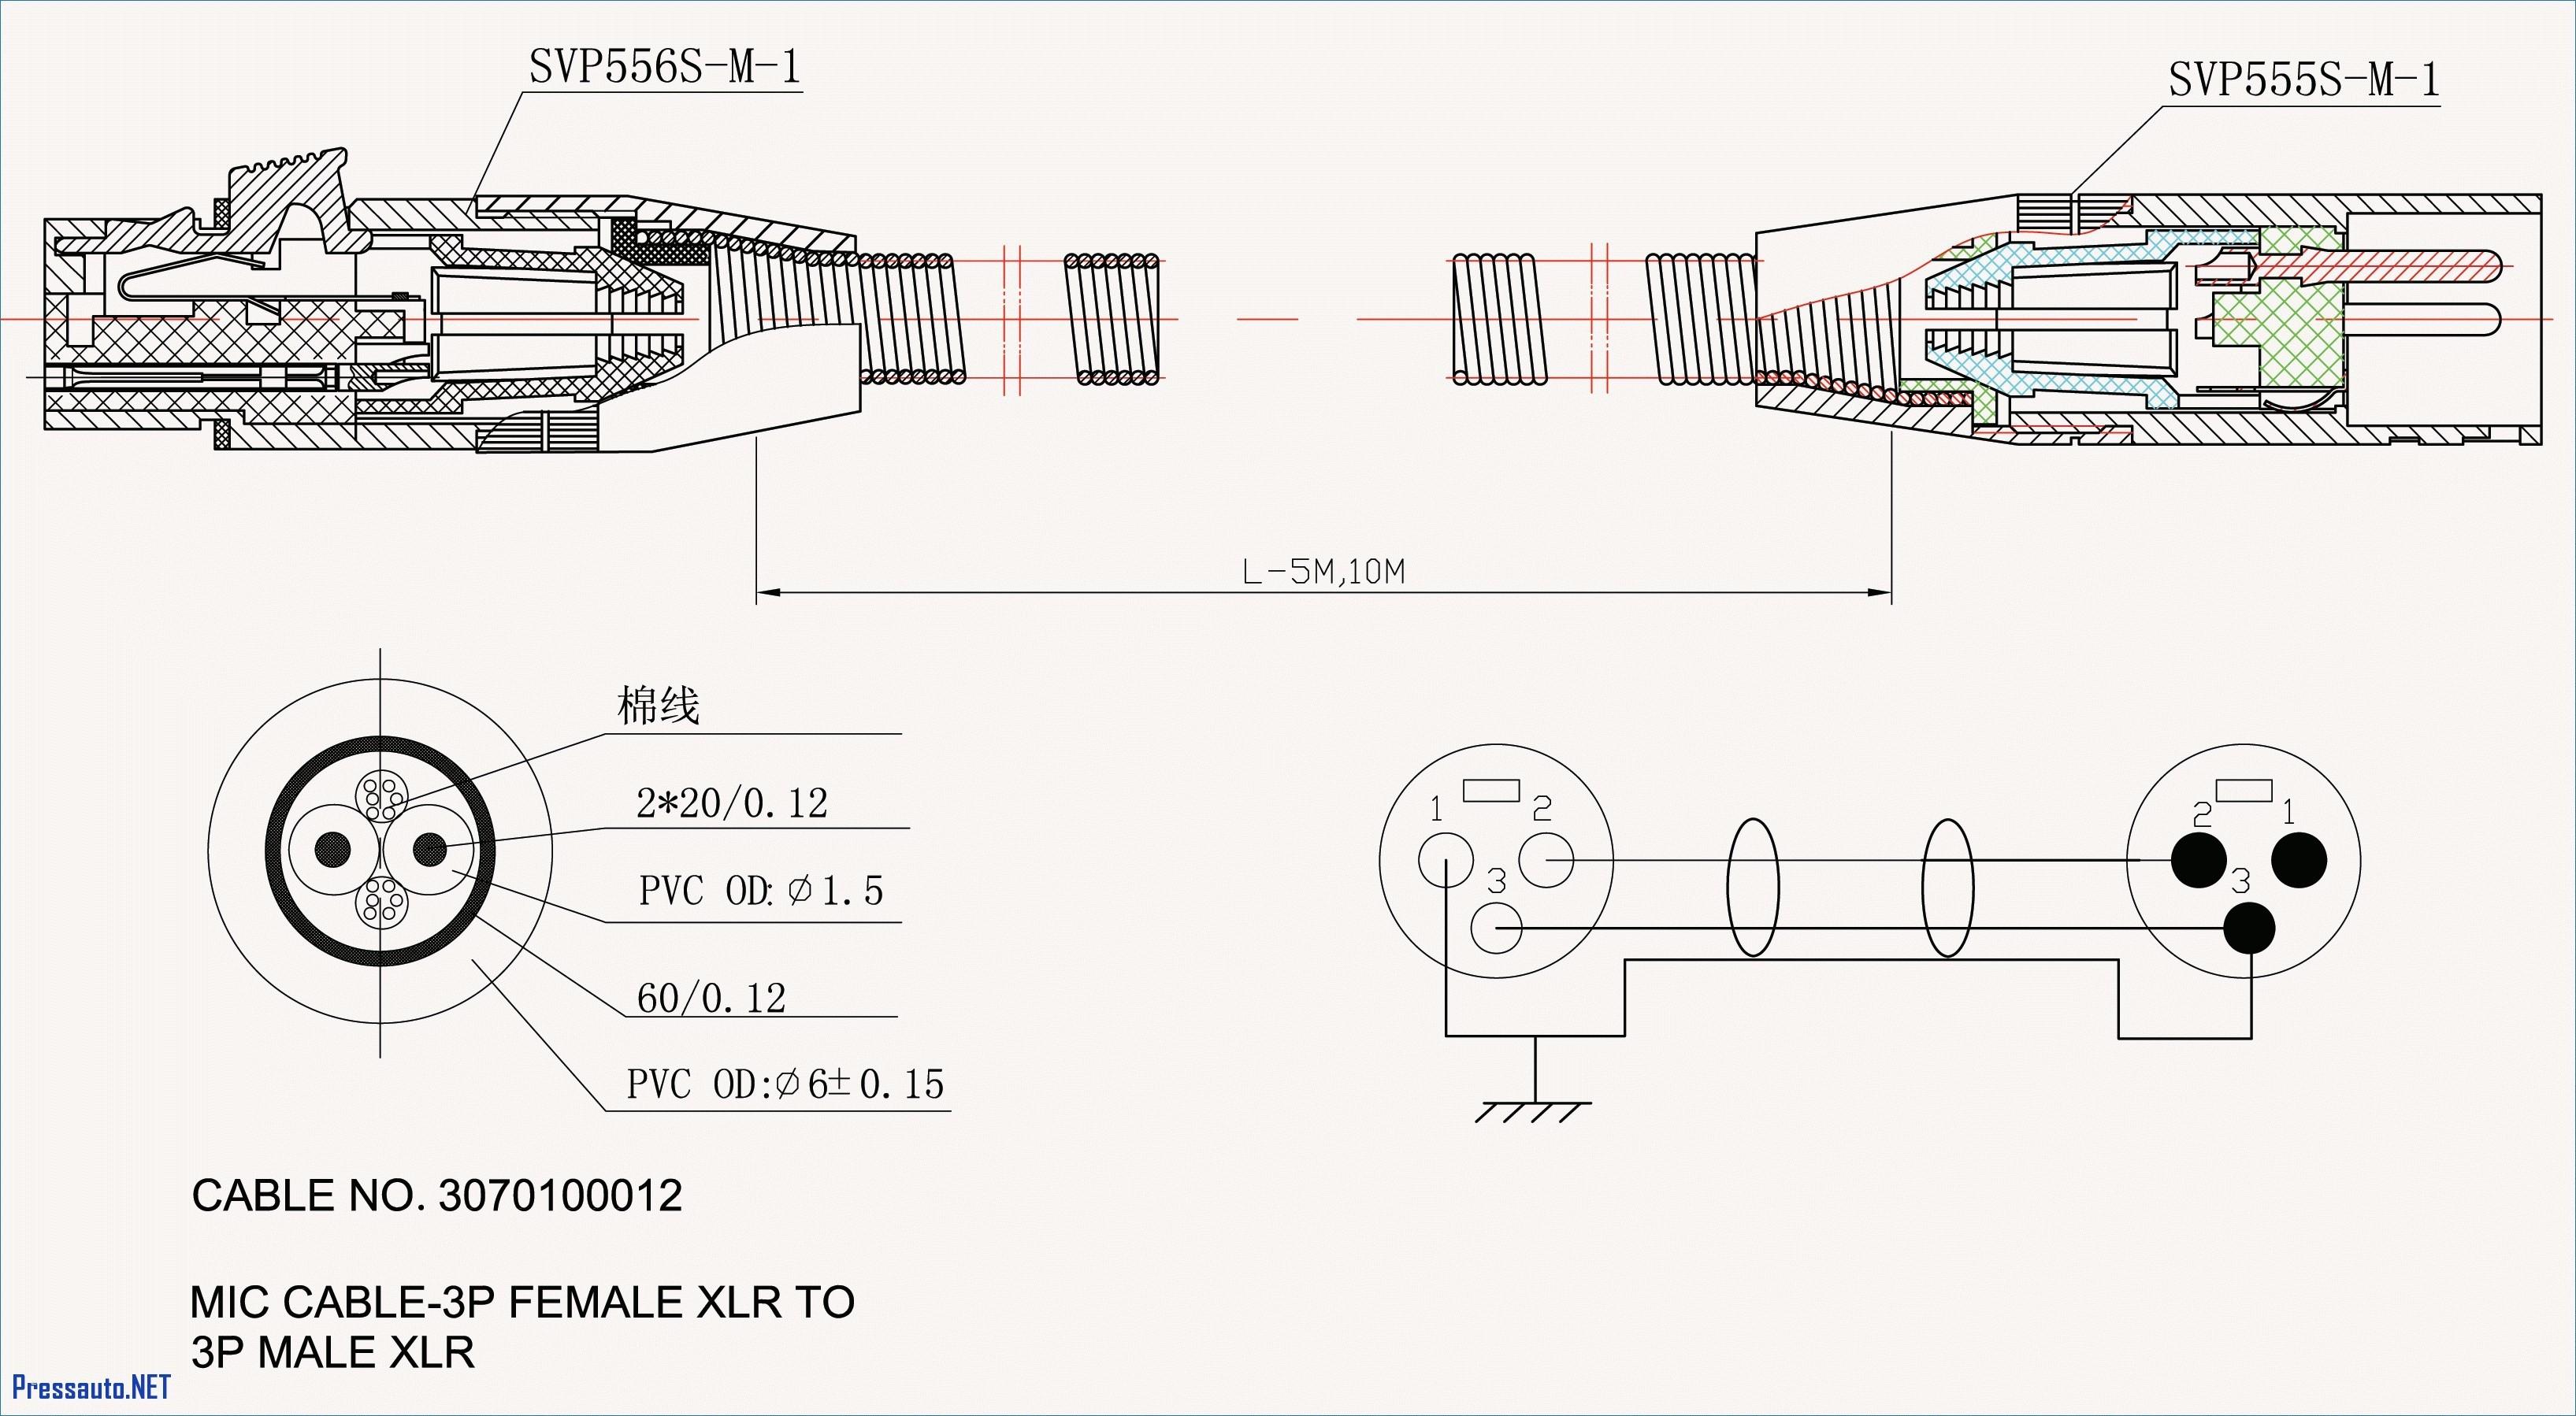 Wiring Diagram for Car Trailer Cute Enclosed Trailer Exterior Lights at Trailer Wiring Diagram ford Of Wiring Diagram for Car Trailer